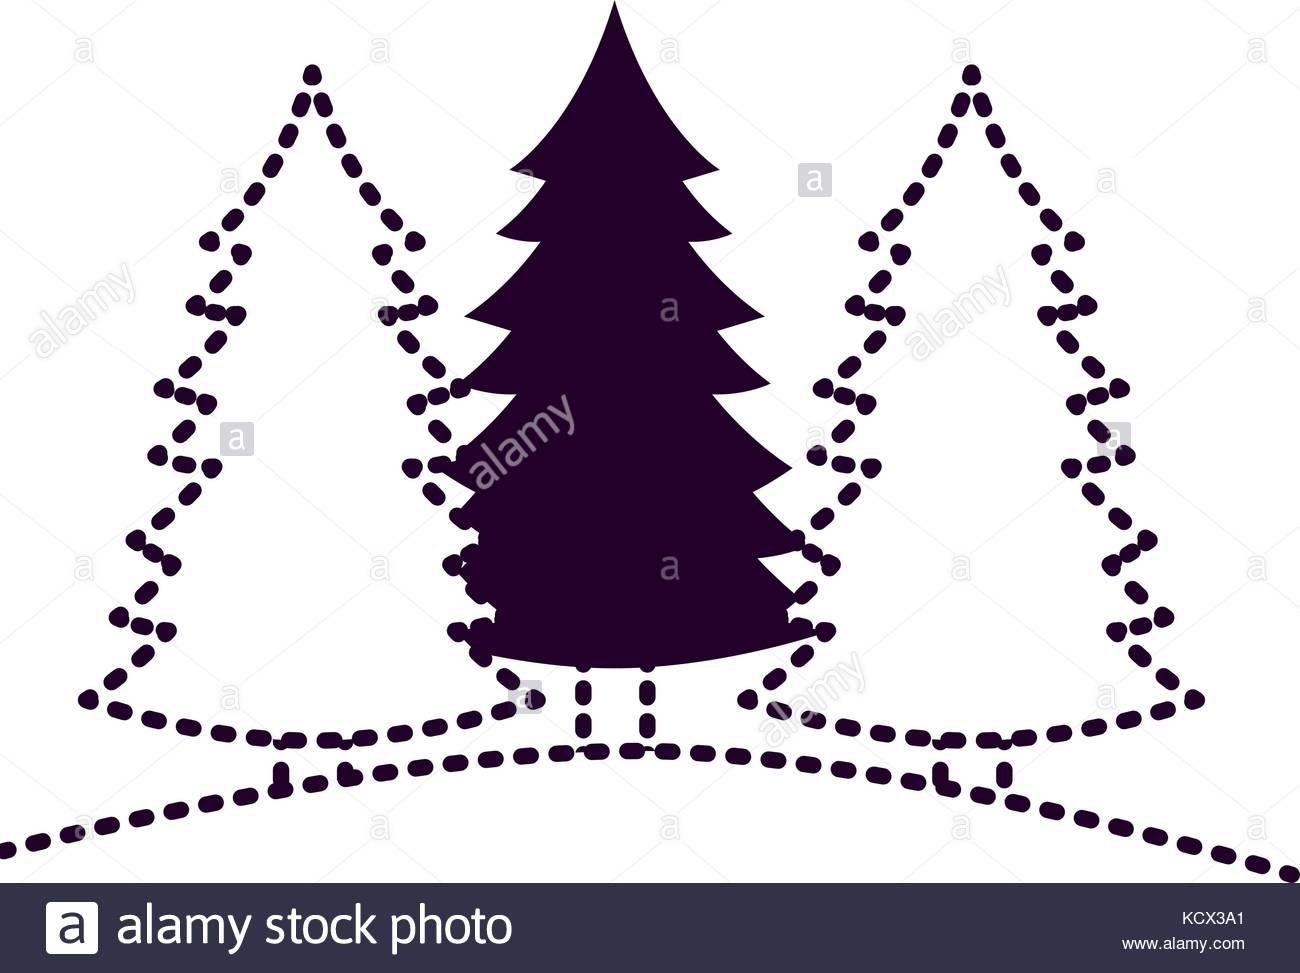 1300x973 Pine Trees Silhouette Stock Photos Amp Pine Trees Silhouette Stock